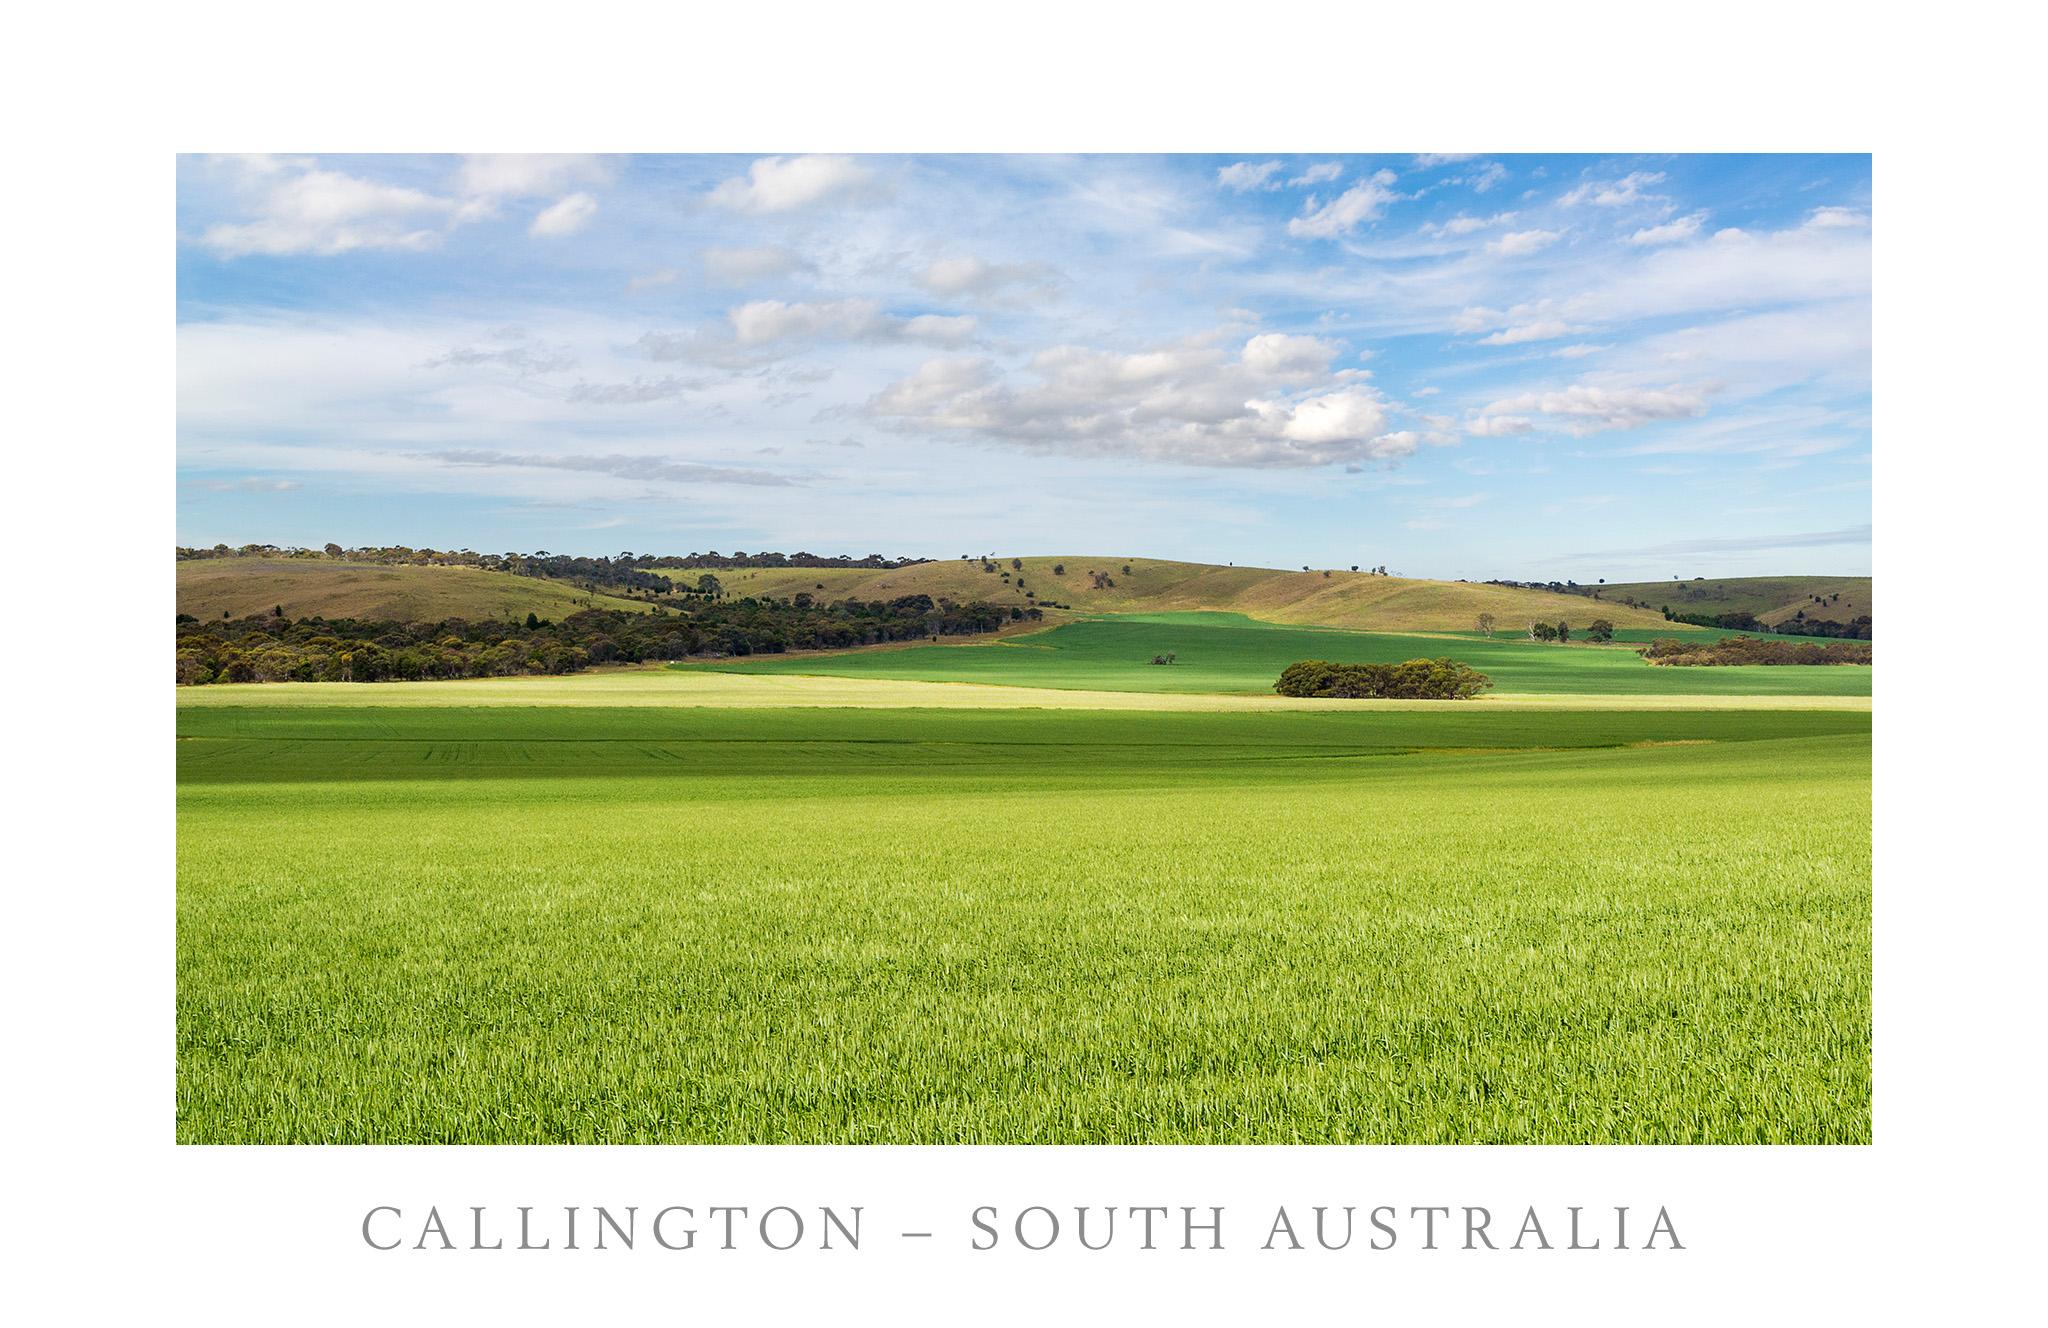 Wheat Fields -- Callington